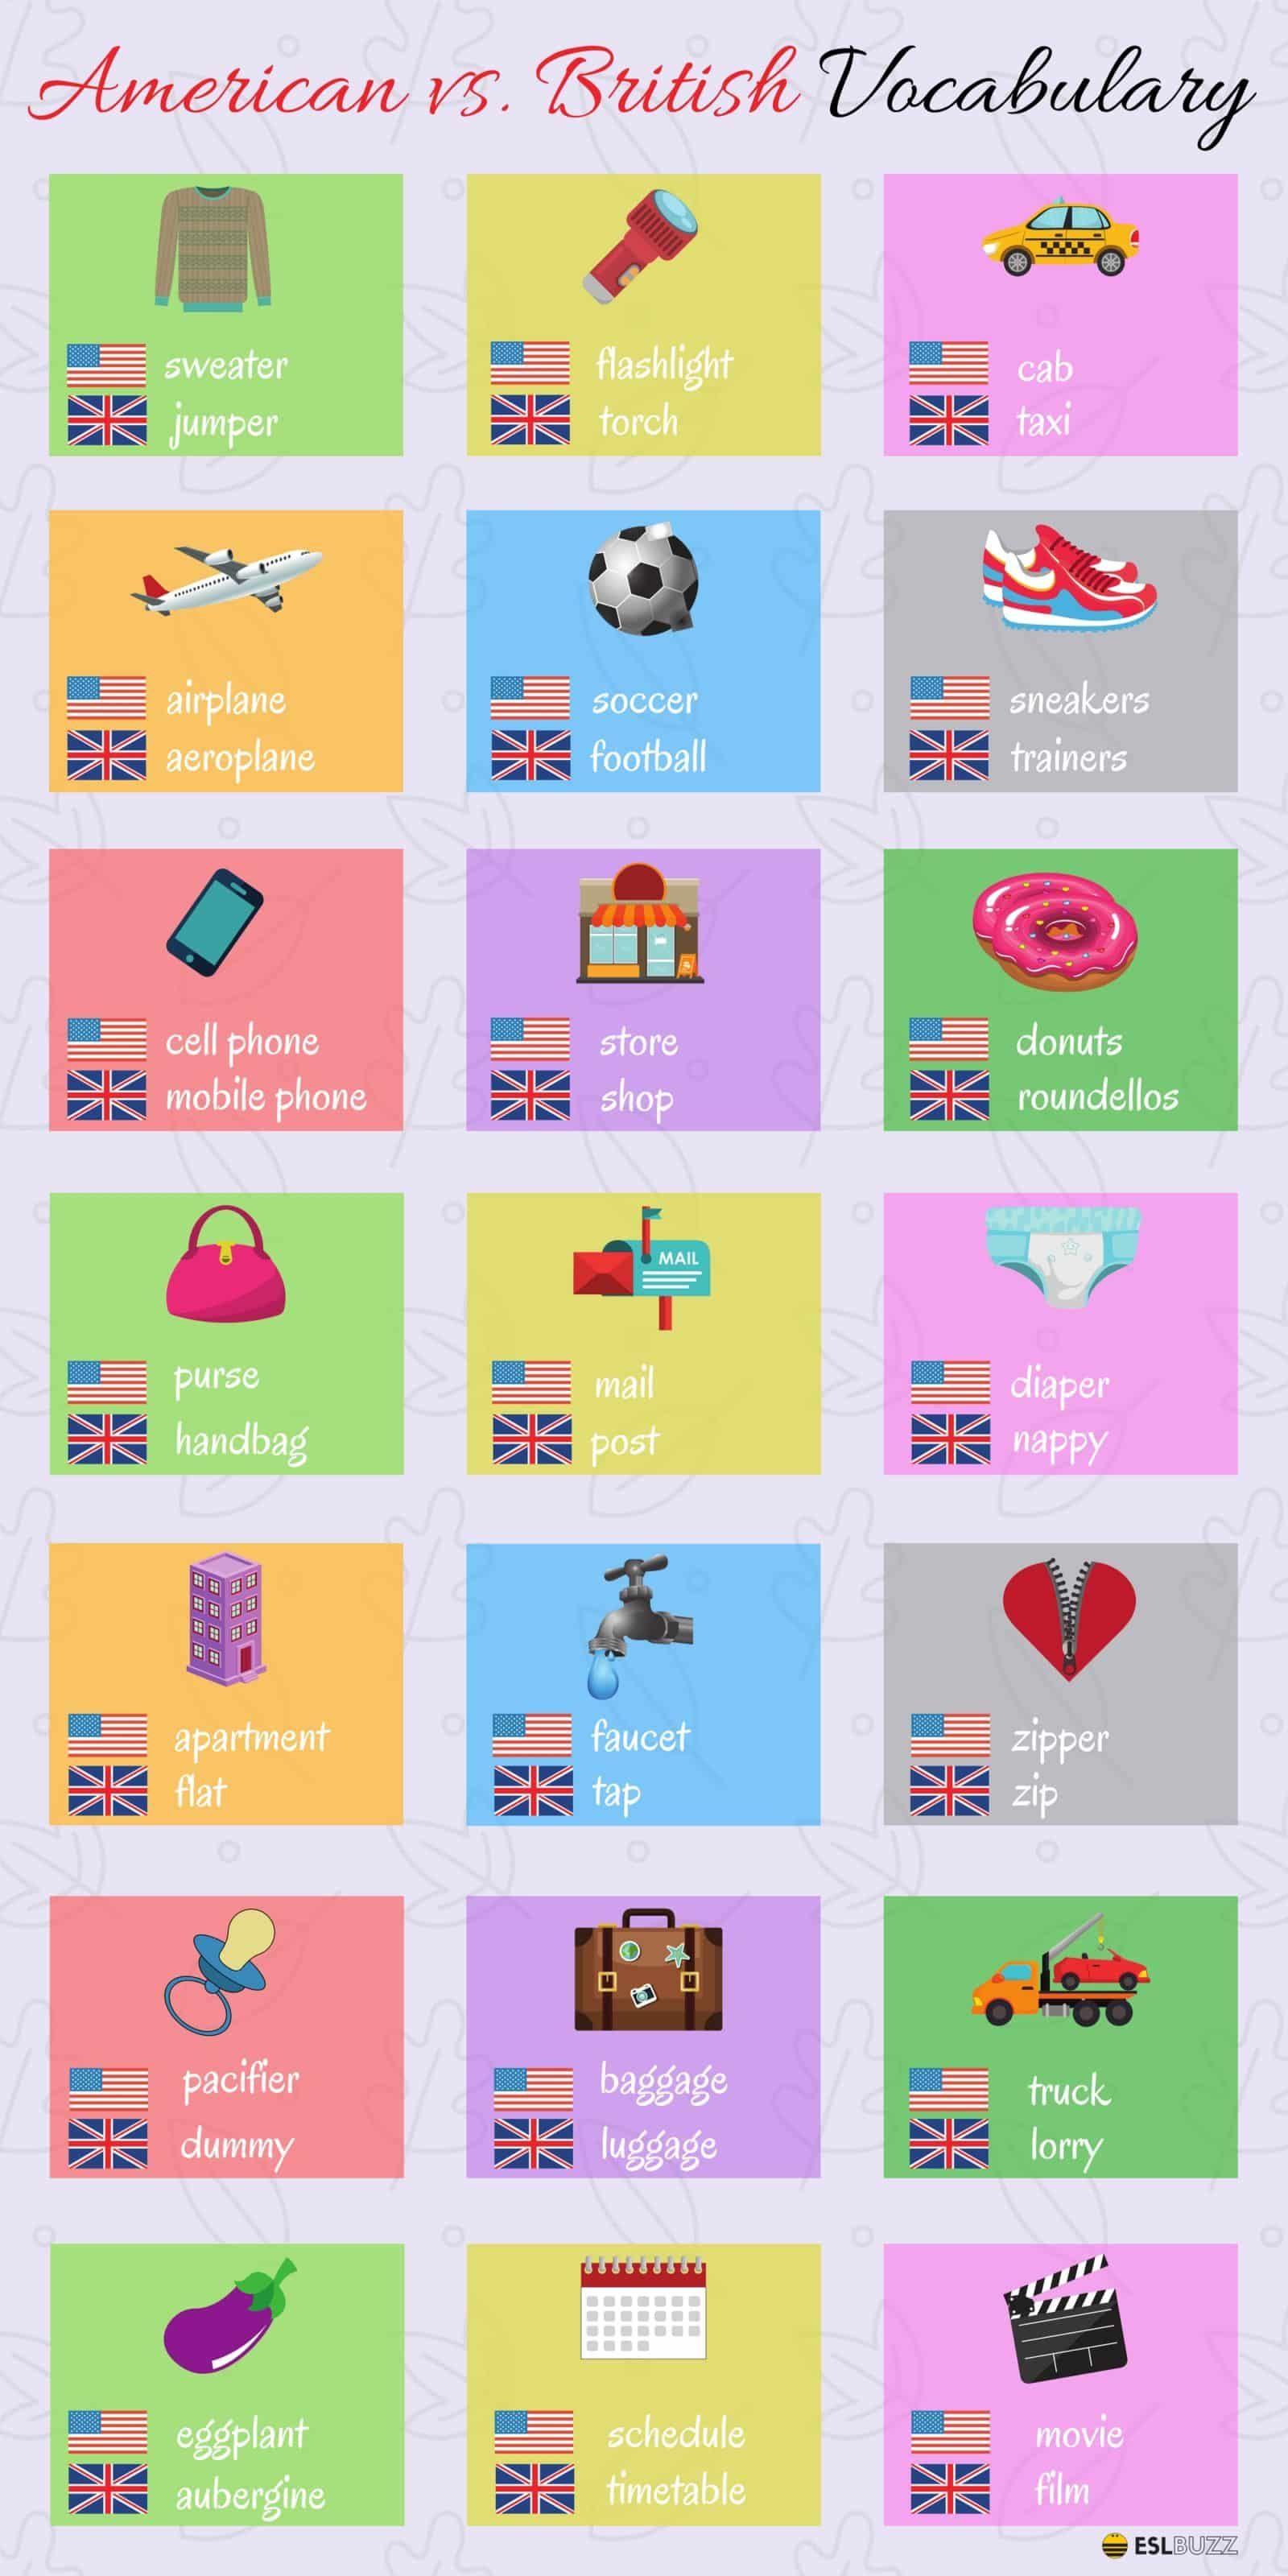 90 Differences Between British And American Words In English Eslbuzz Learning English Pelajaran Bahasa Inggris Kosakata Bahasa Inggris Tata Bahasa Inggris